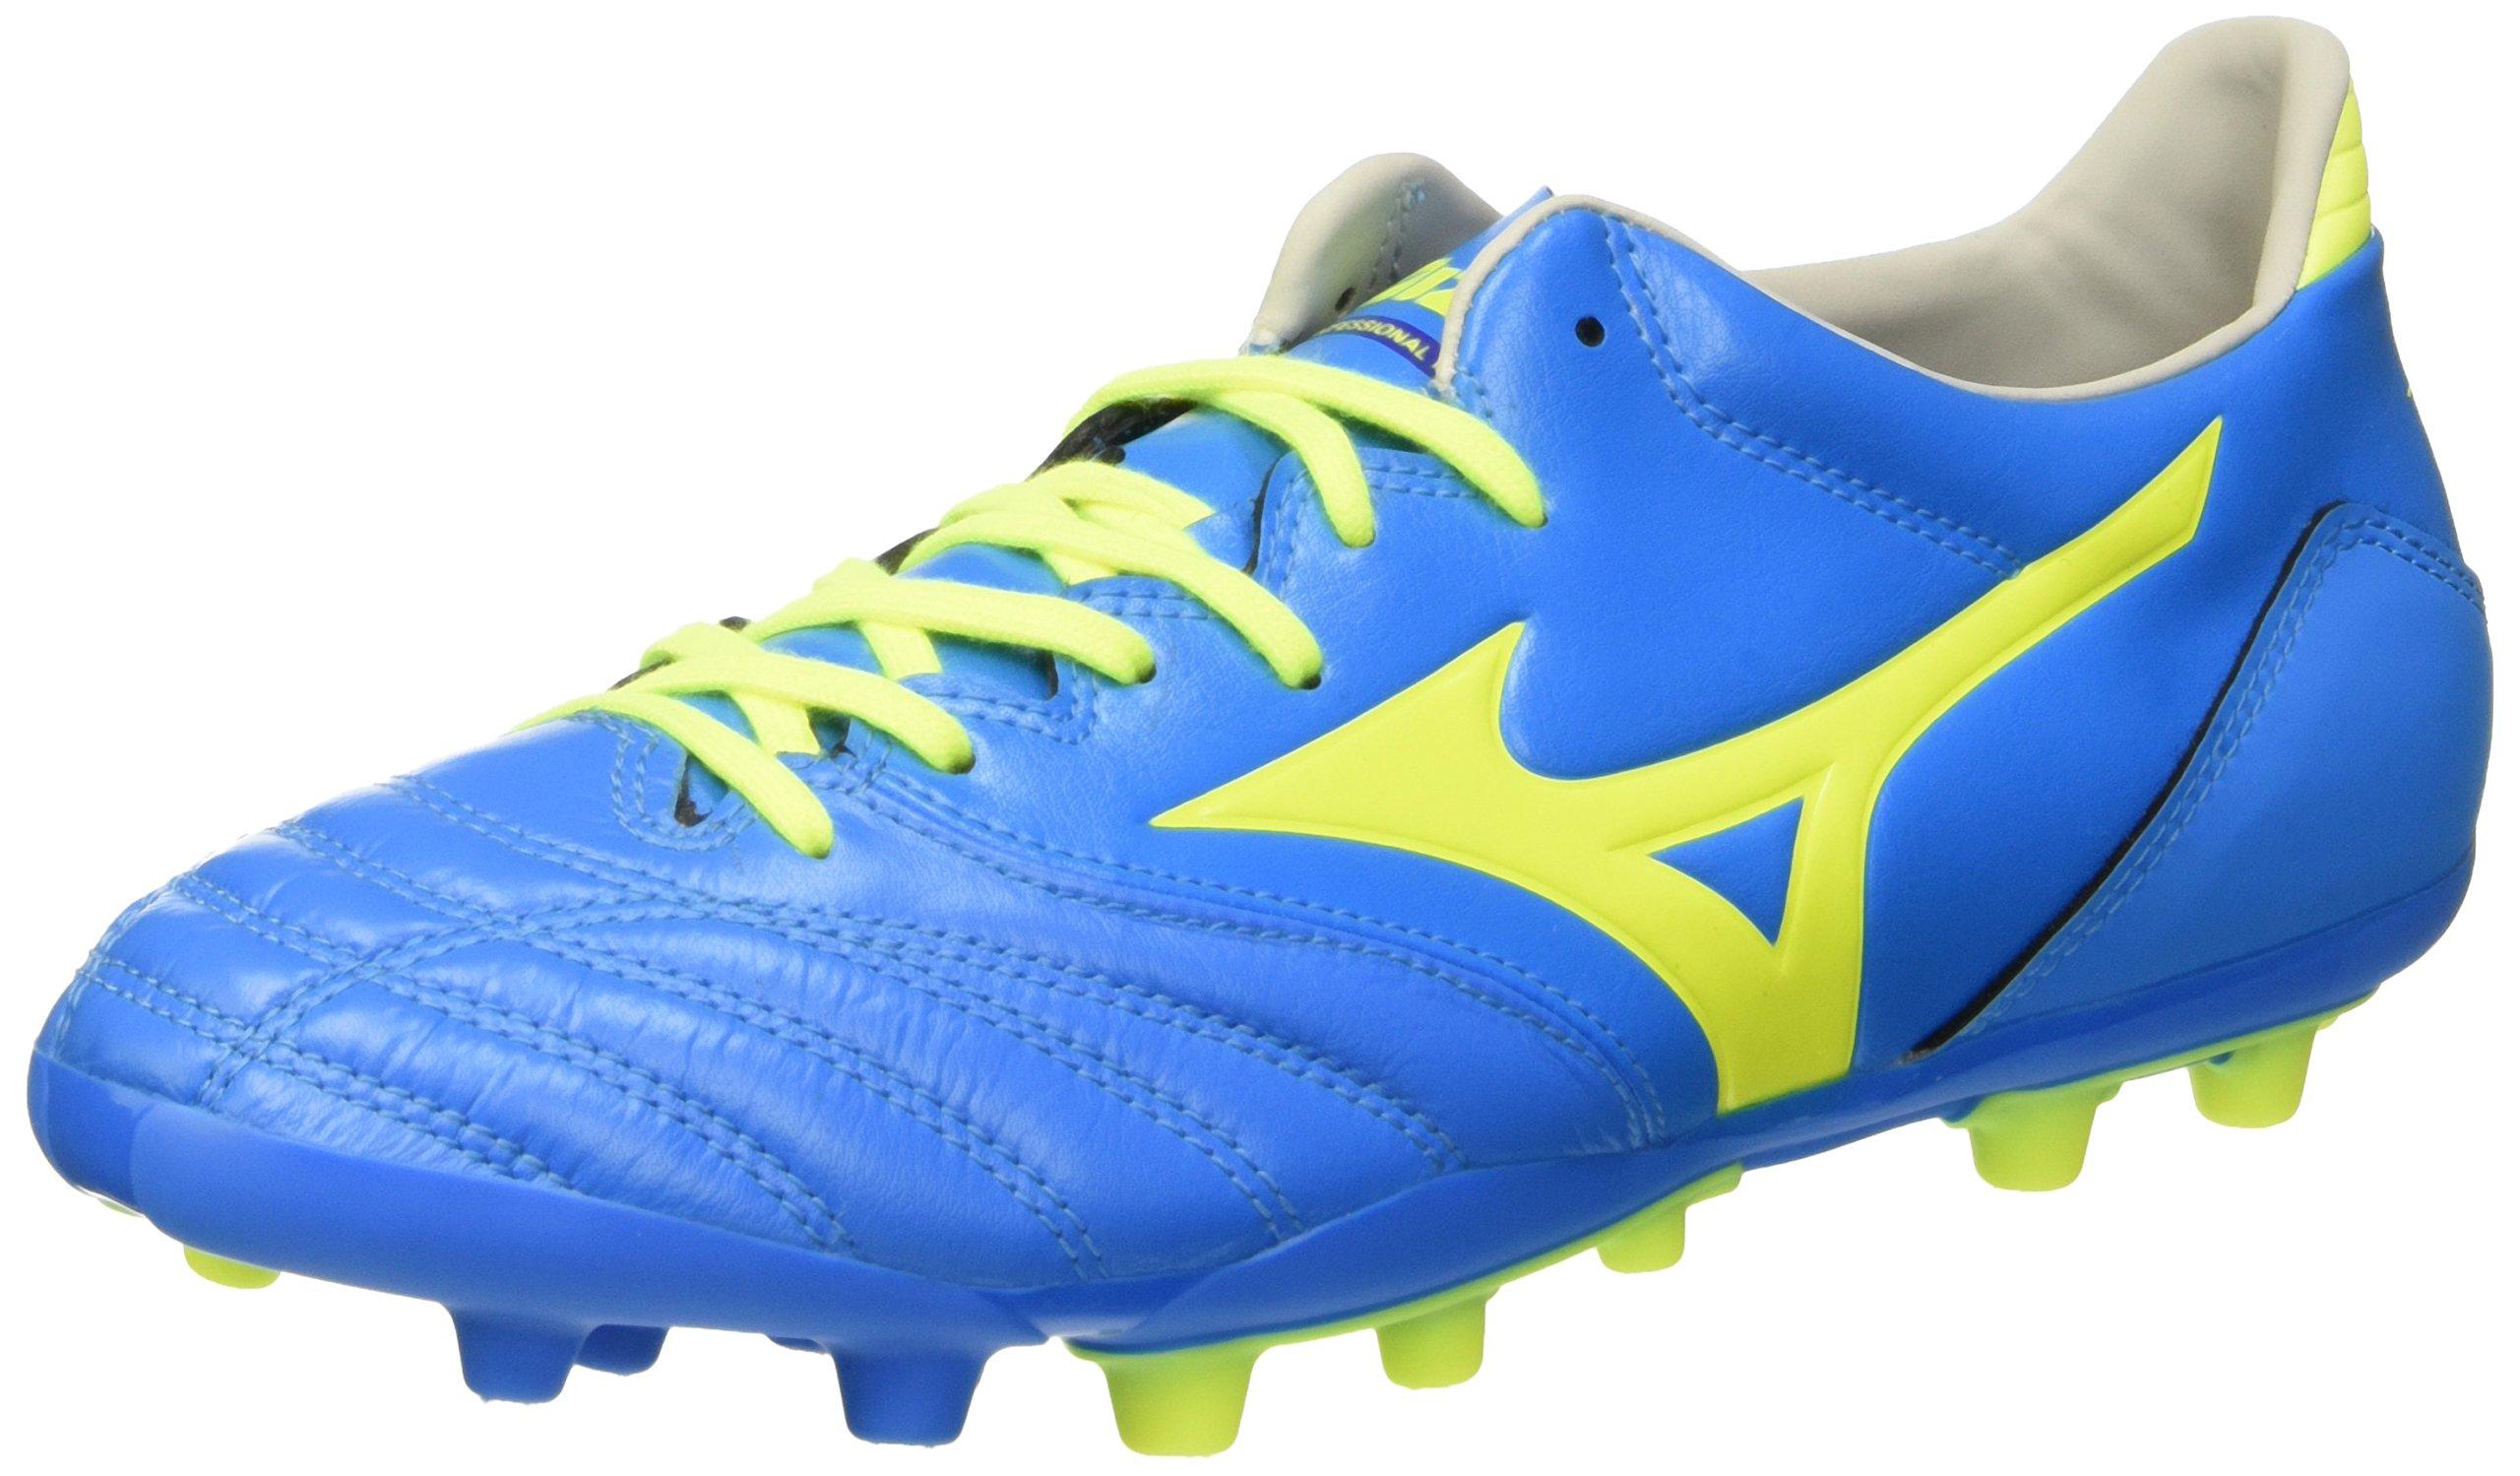 Mizuno Morelia 5 Football AgChaussures De Neo safety Yellow40 Eu HommeBleudiva Blue Kl IfyYbvm6g7